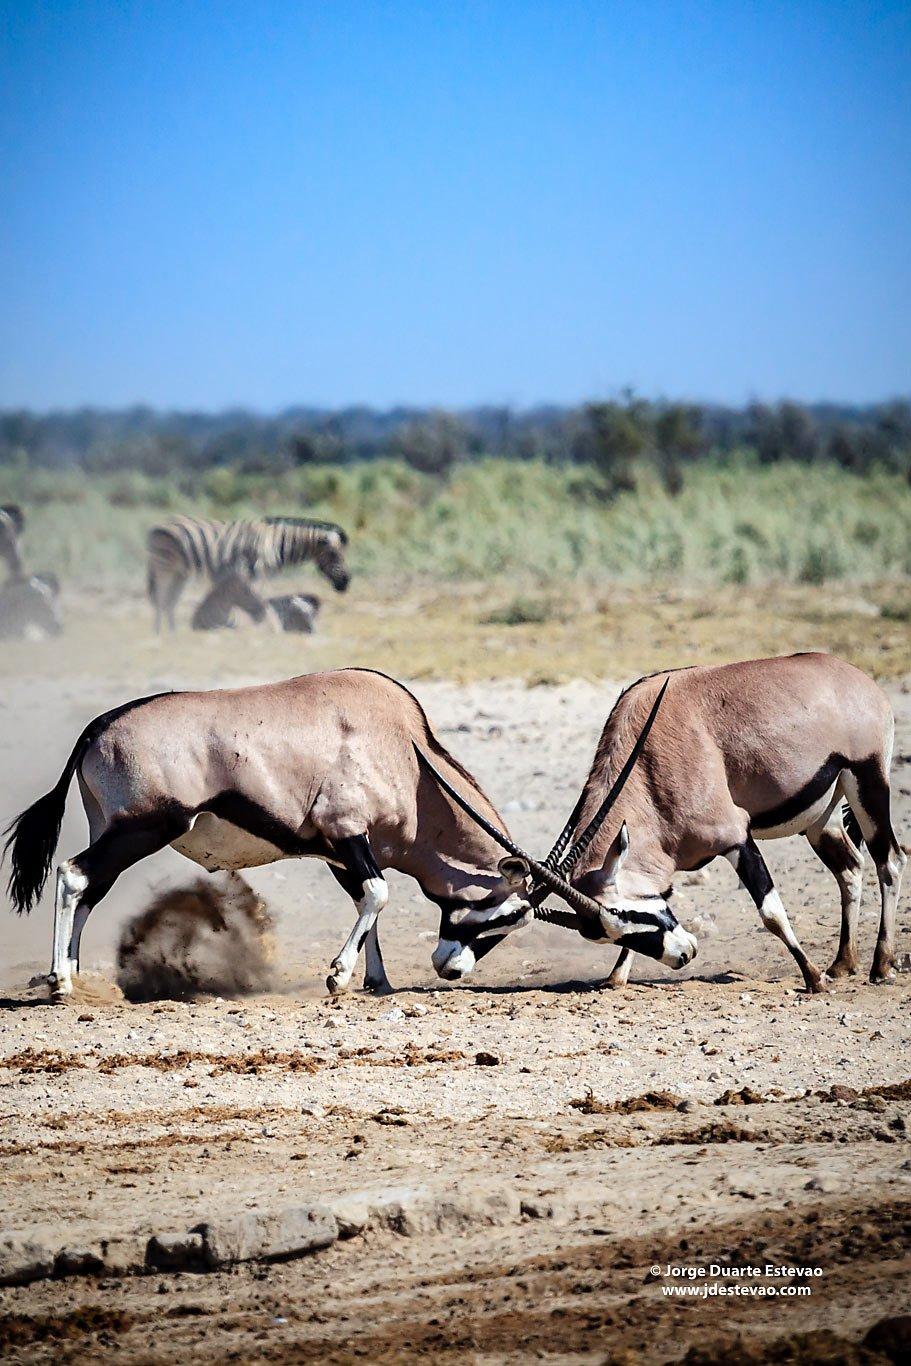 gemsbok fight Etosha National Park Namibia zebra background